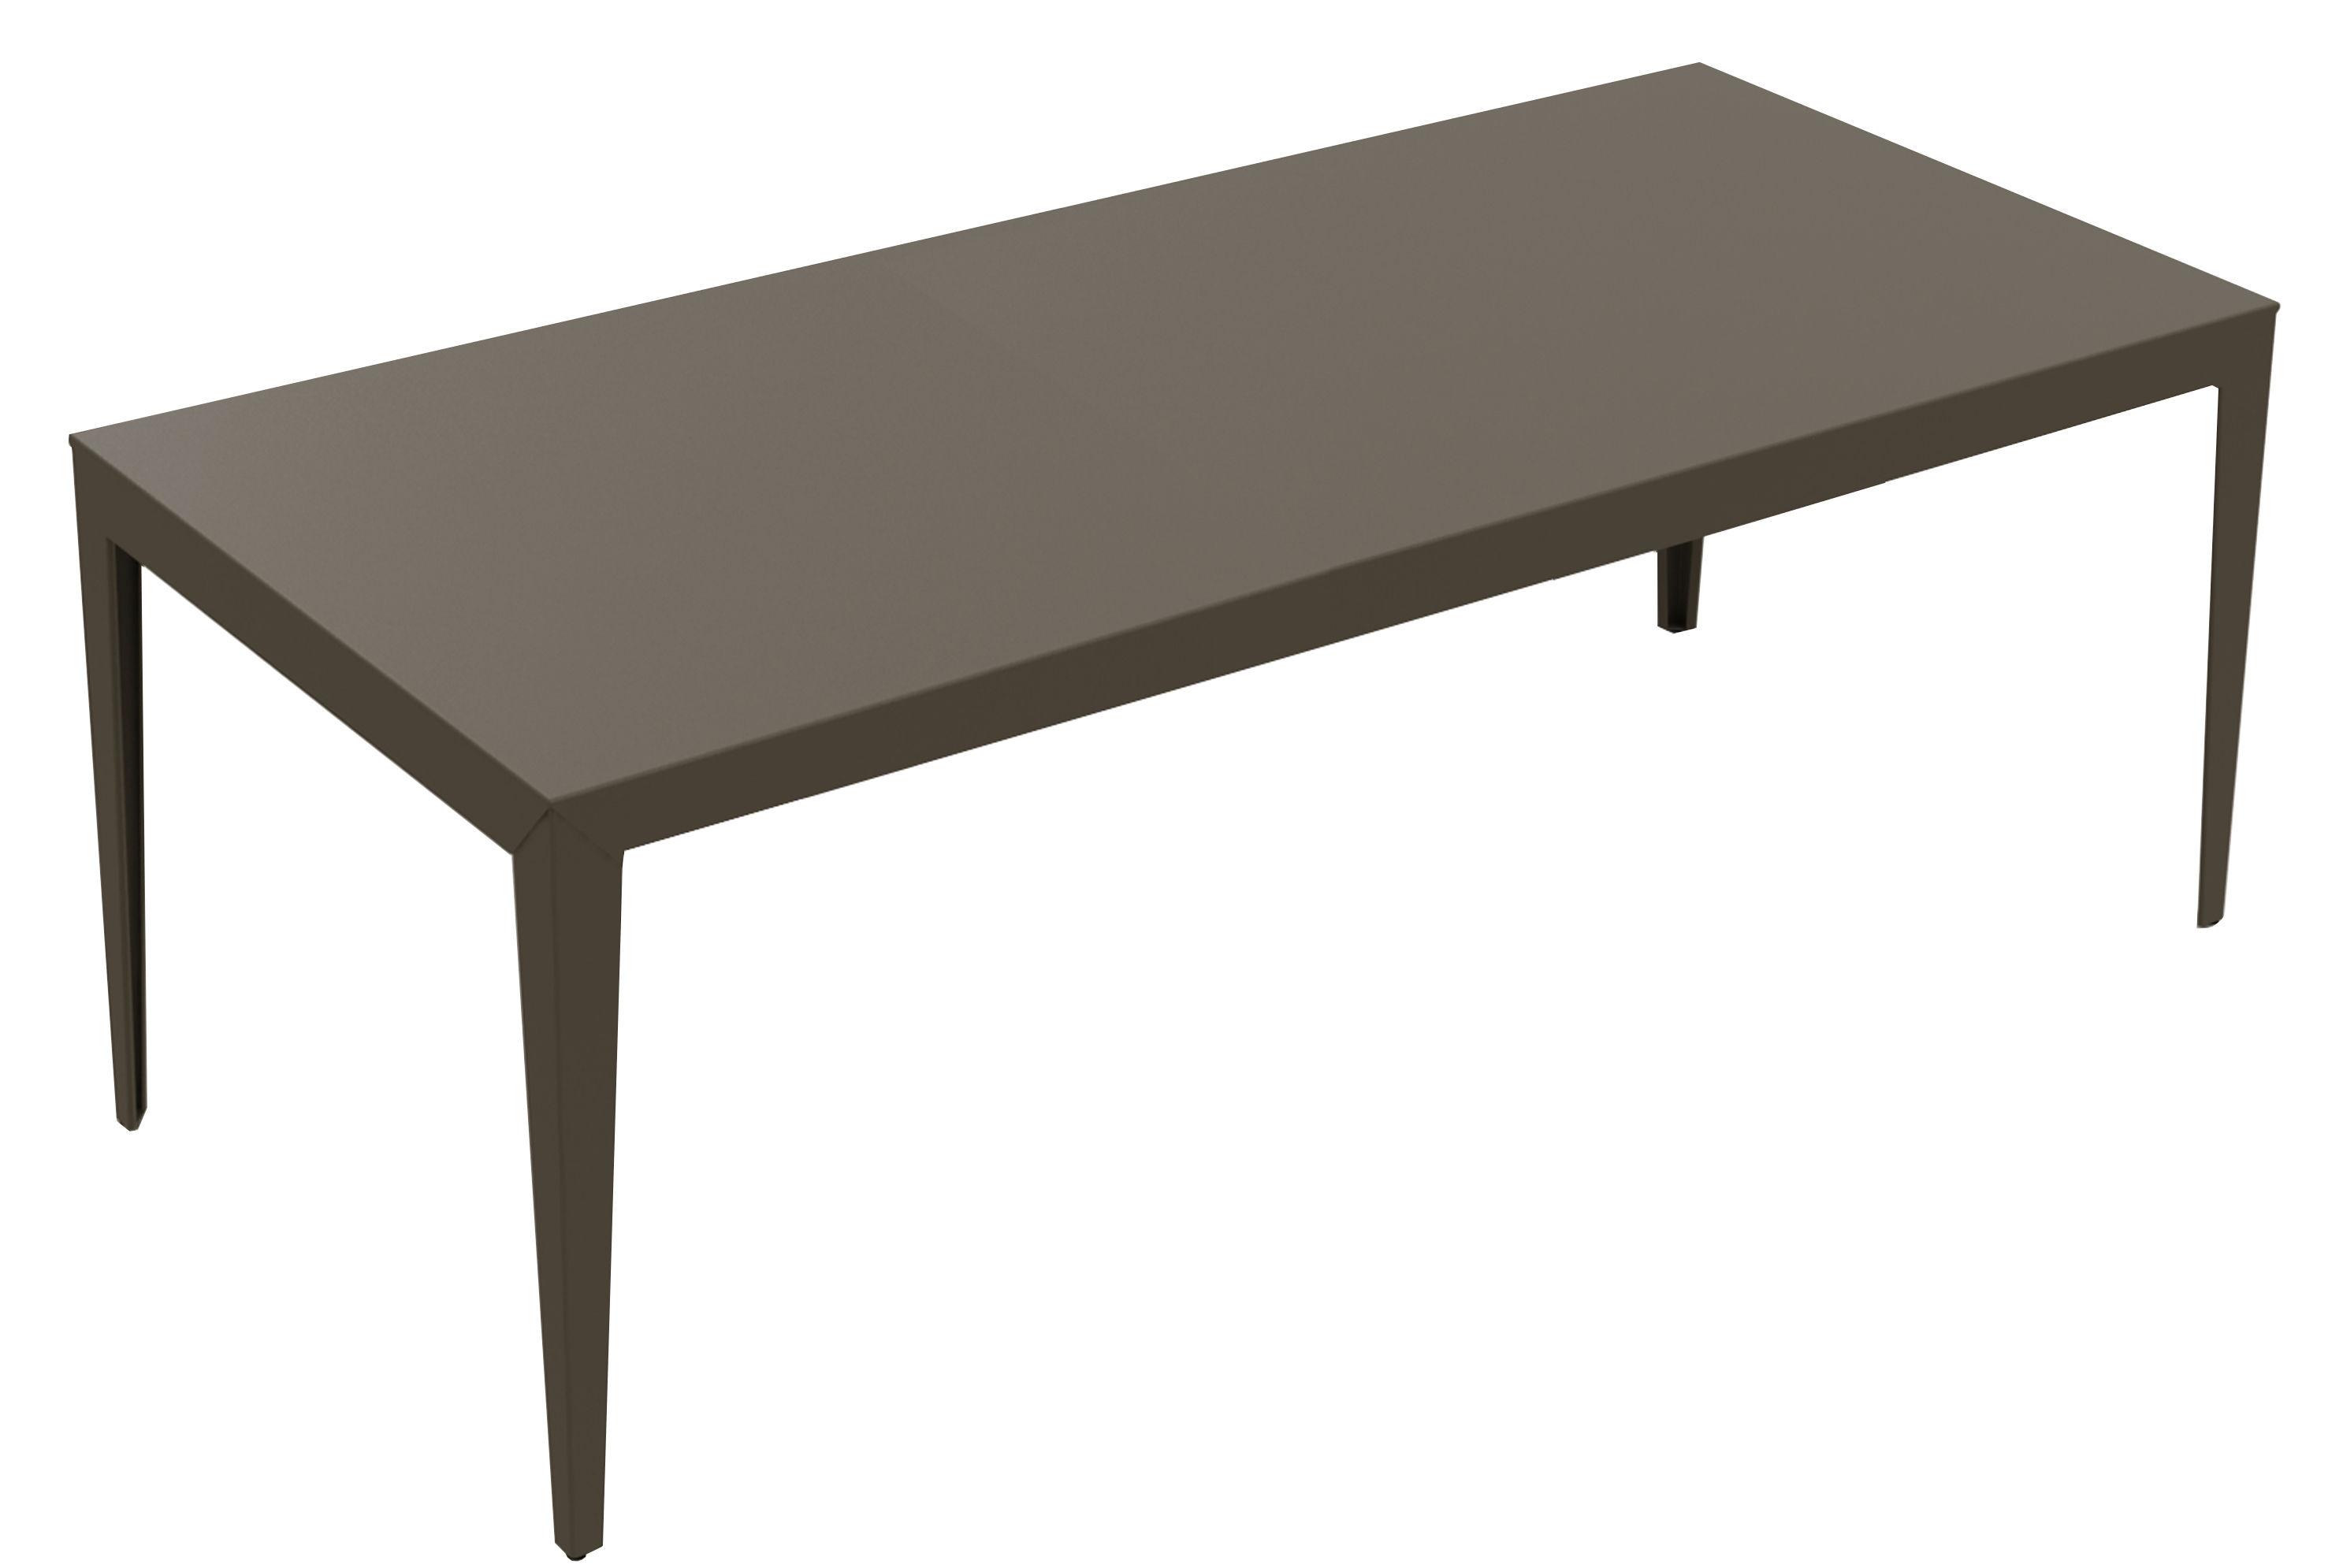 table basse galet matiere grise. Black Bedroom Furniture Sets. Home Design Ideas